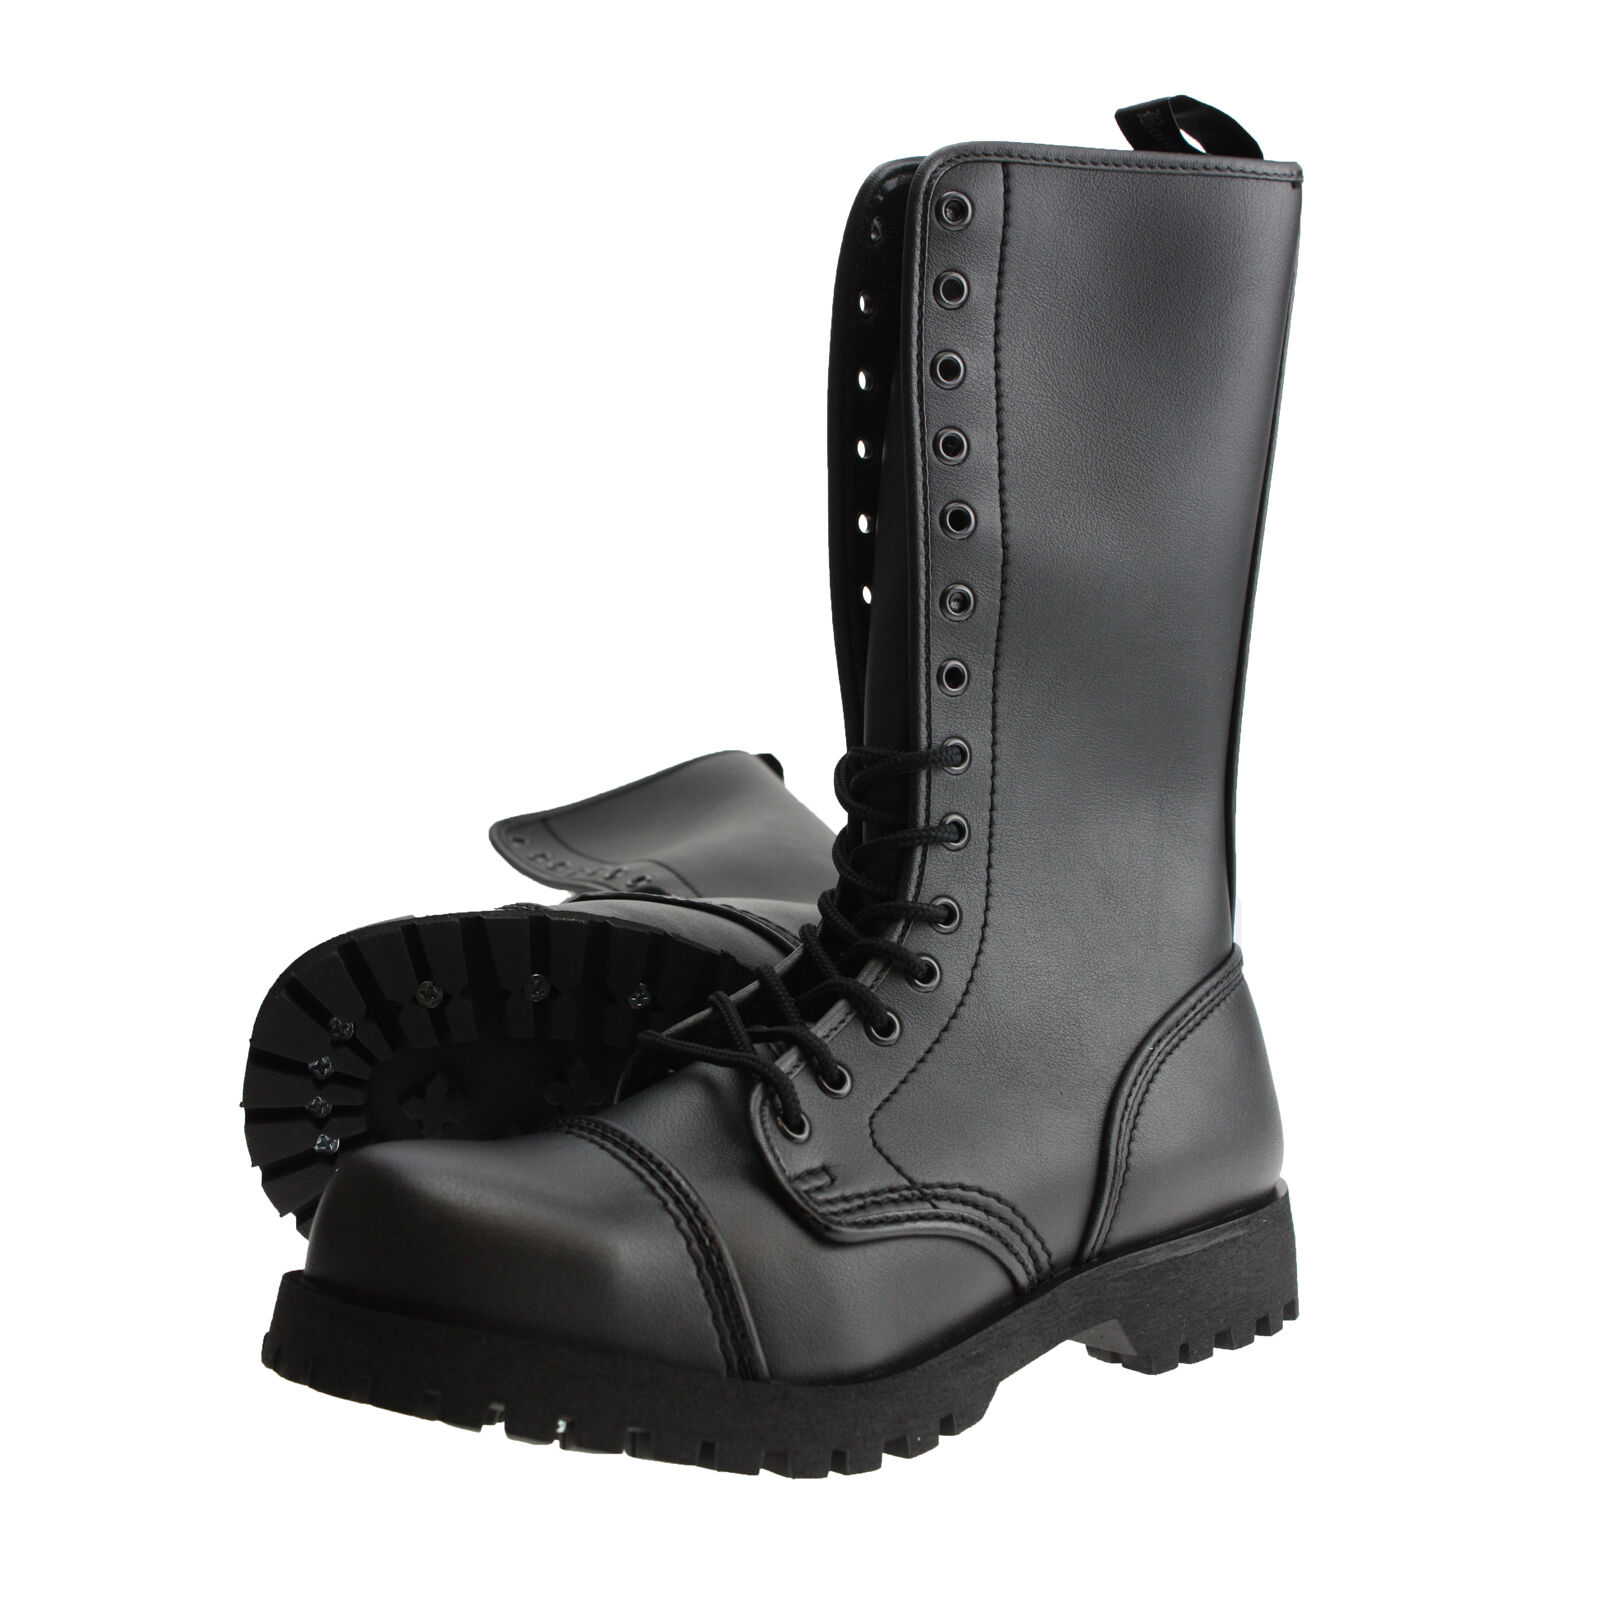 Boots and Braces 14 Loch Vegetarian Vegi Vegan Stiefel Boot black Stahlkappen